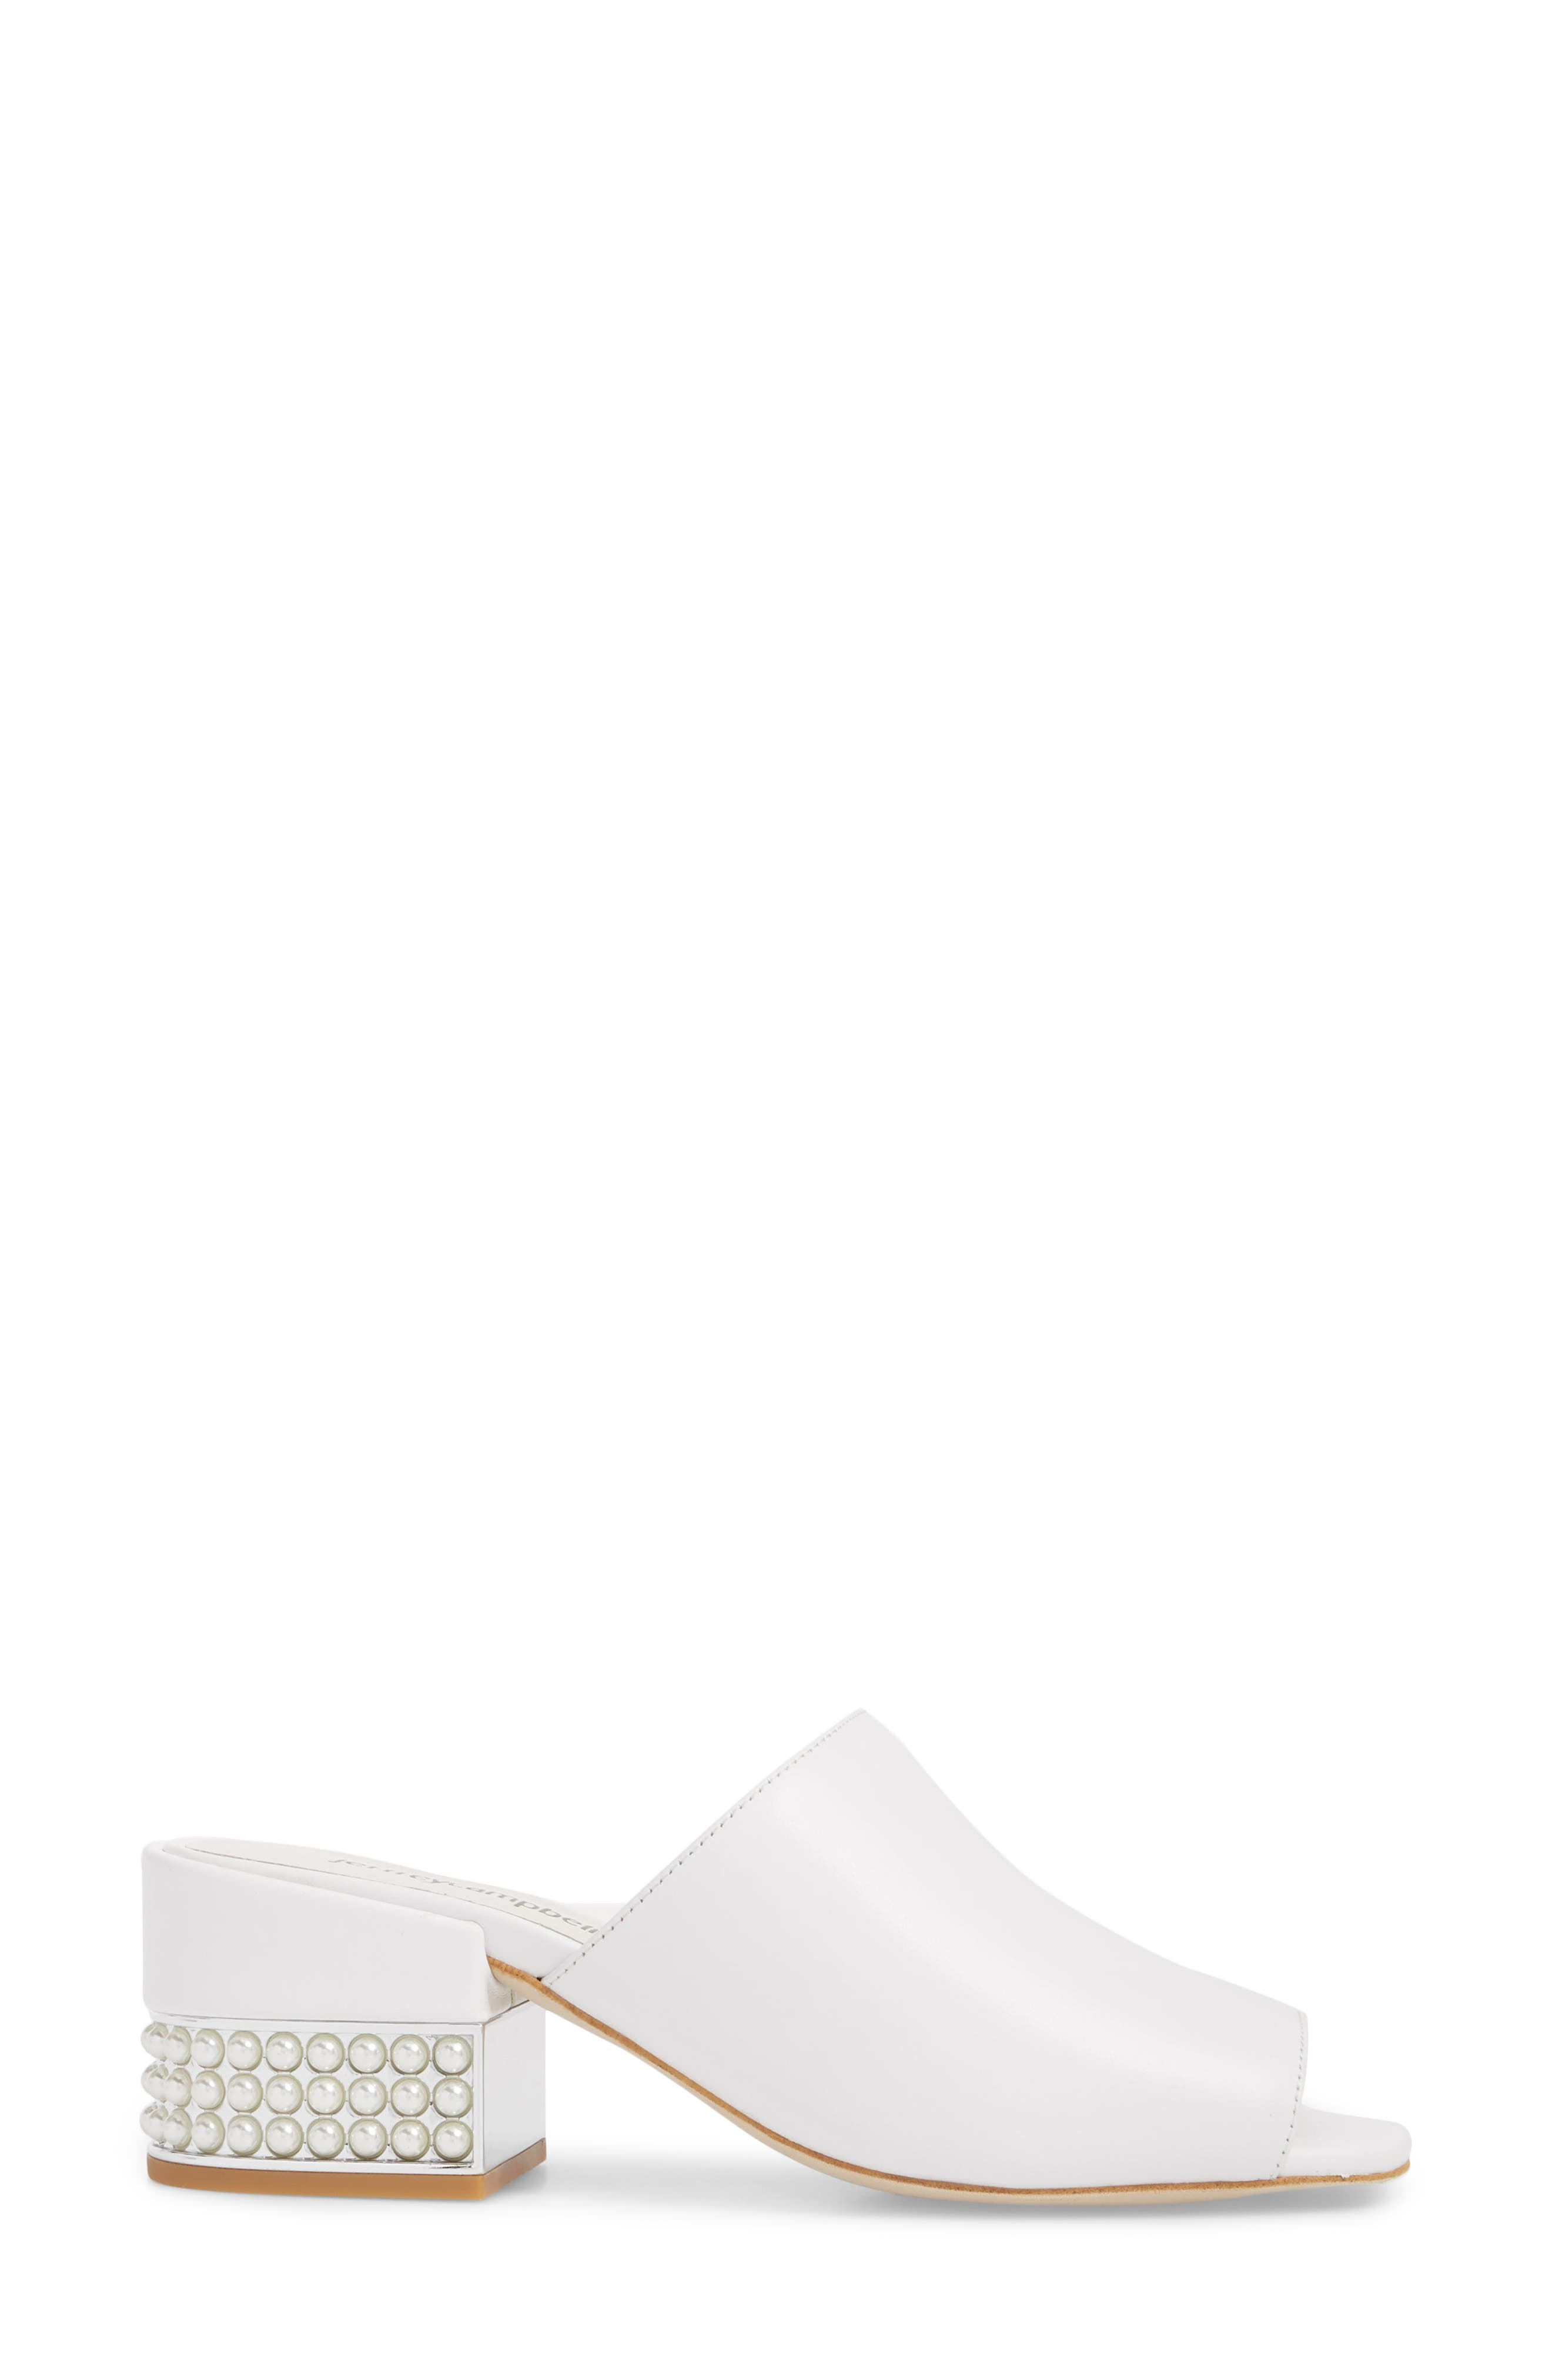 Teseida Embellished Mule,                             Alternate thumbnail 3, color,                             White/ Silver